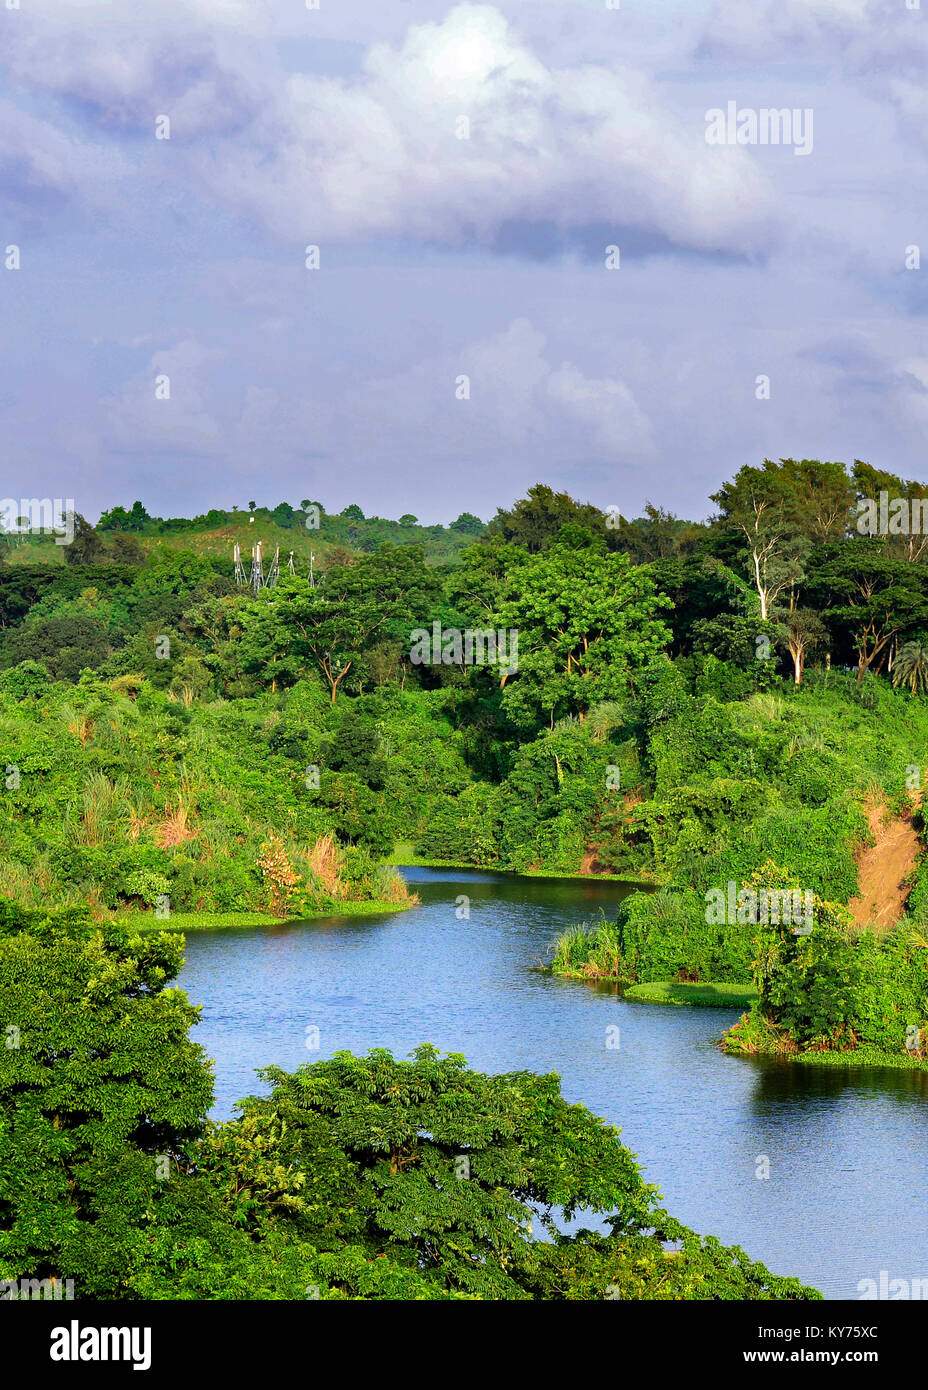 Vatiyari Lake Chittagong, Bangladesh - Stock Image